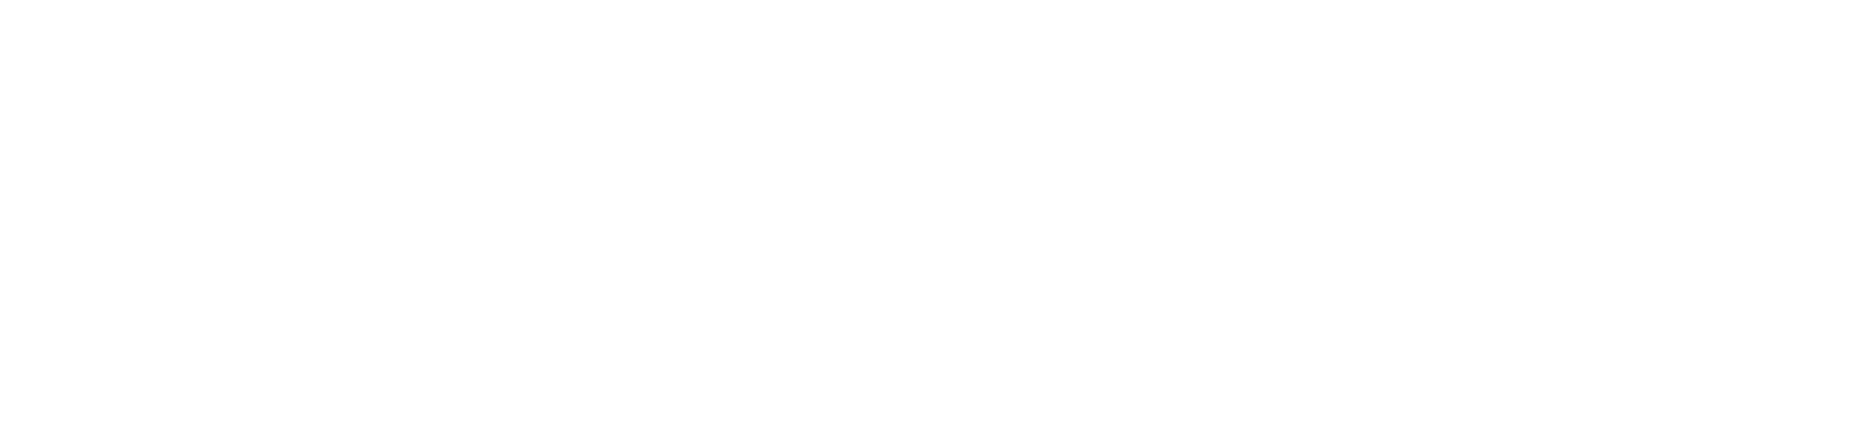 Operative.One Platform